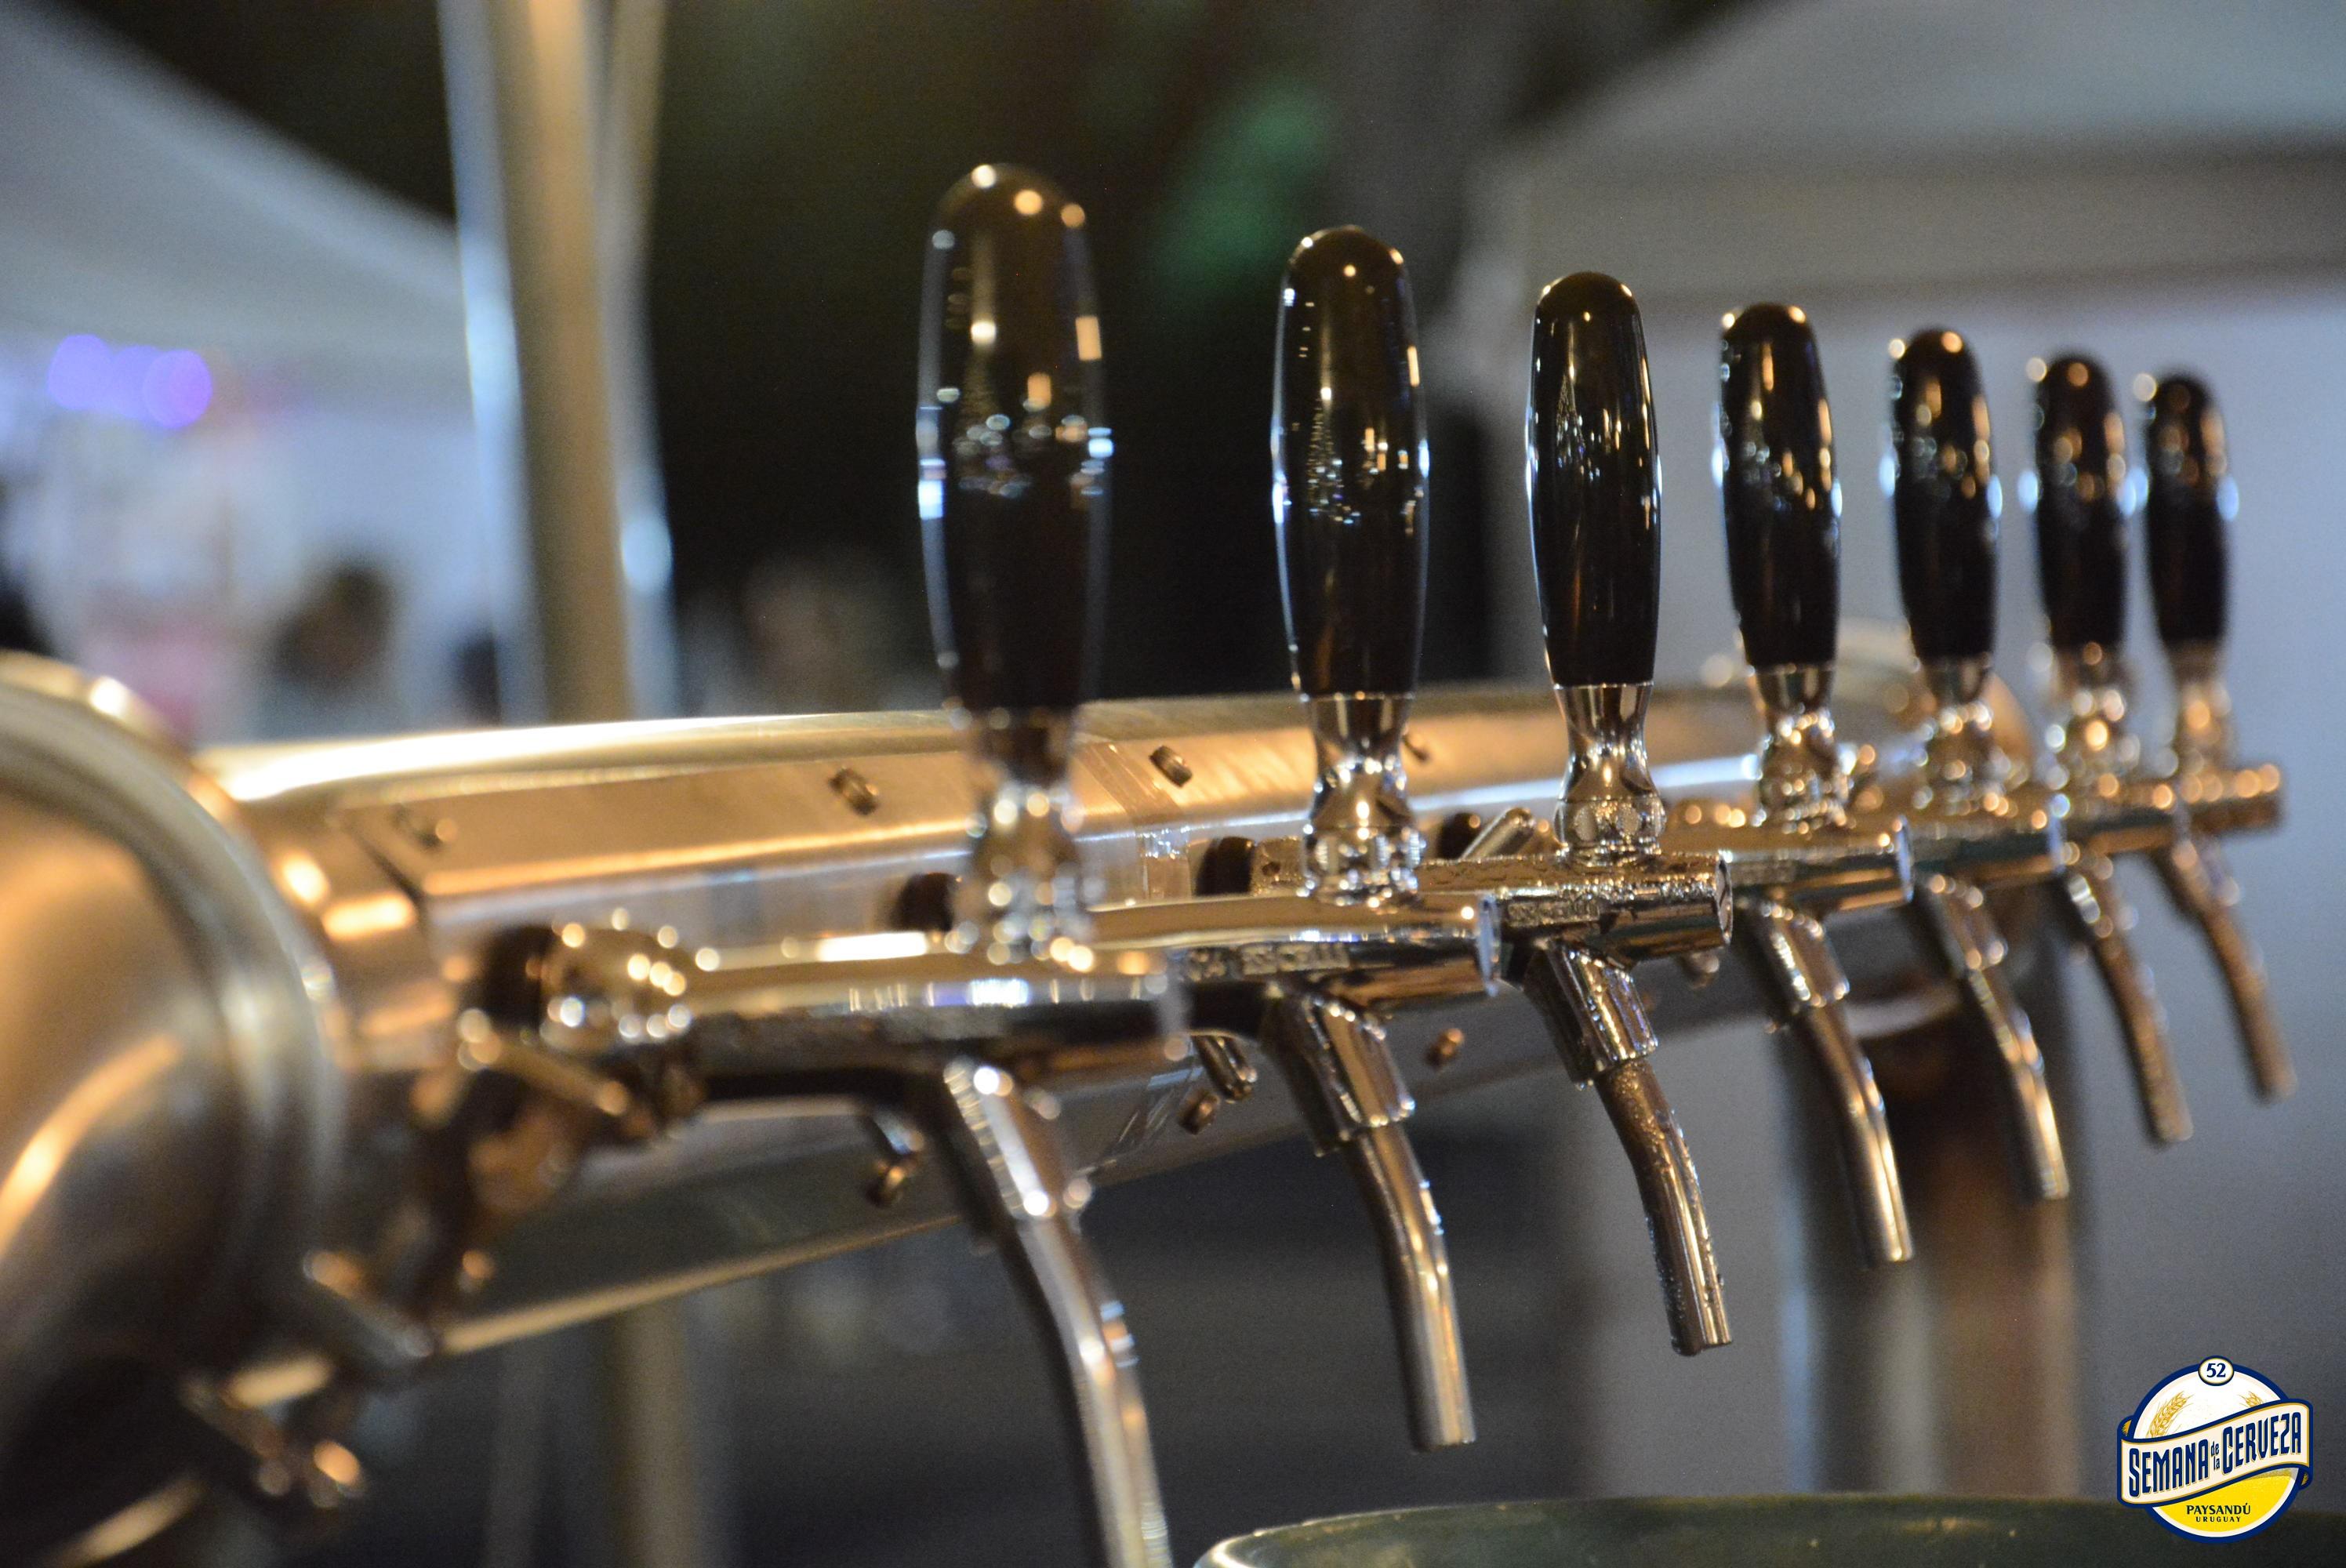 Agenda del lunes de la Semana de la Cerveza